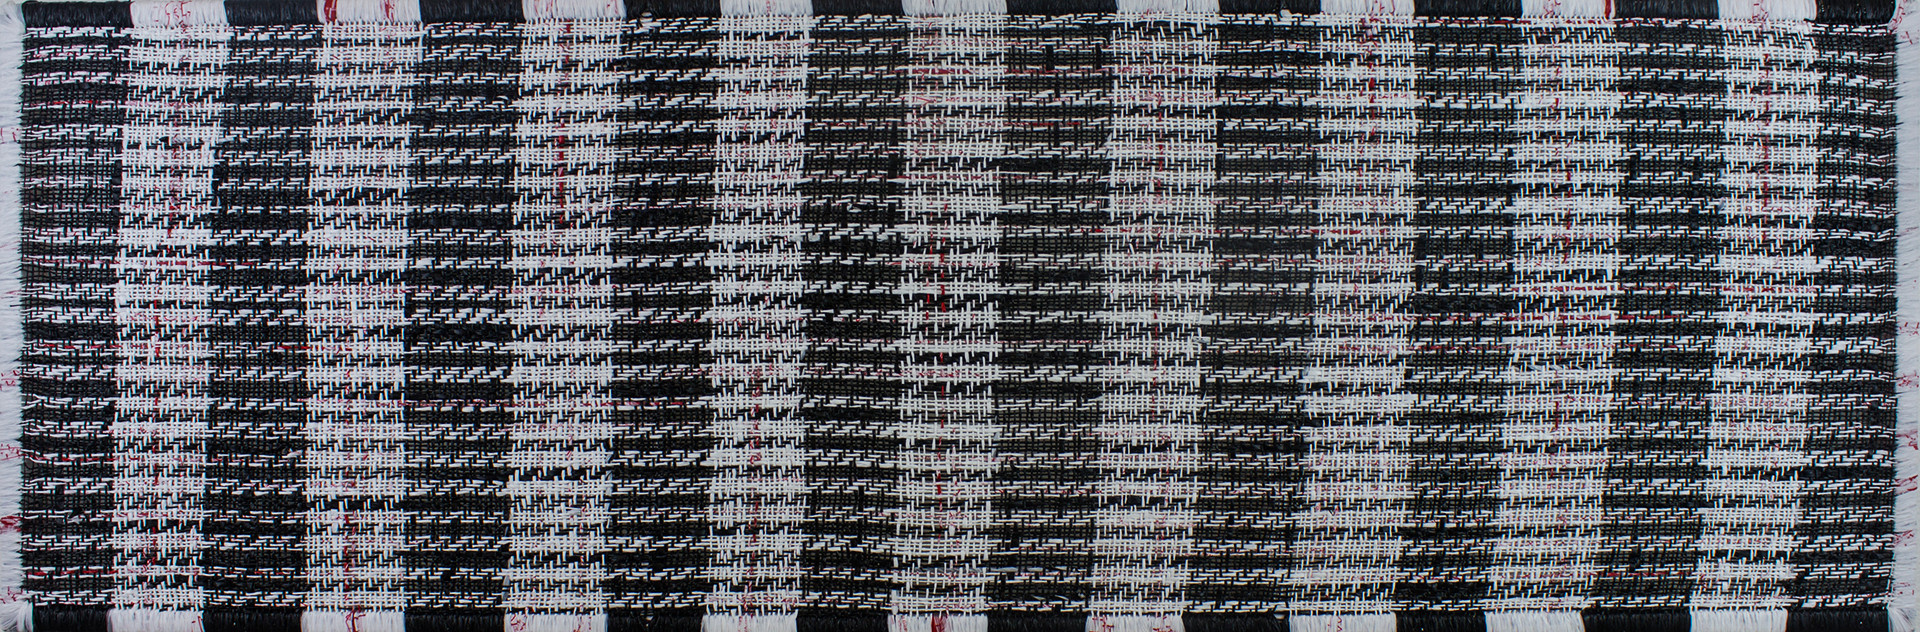 Untitled (Black White)